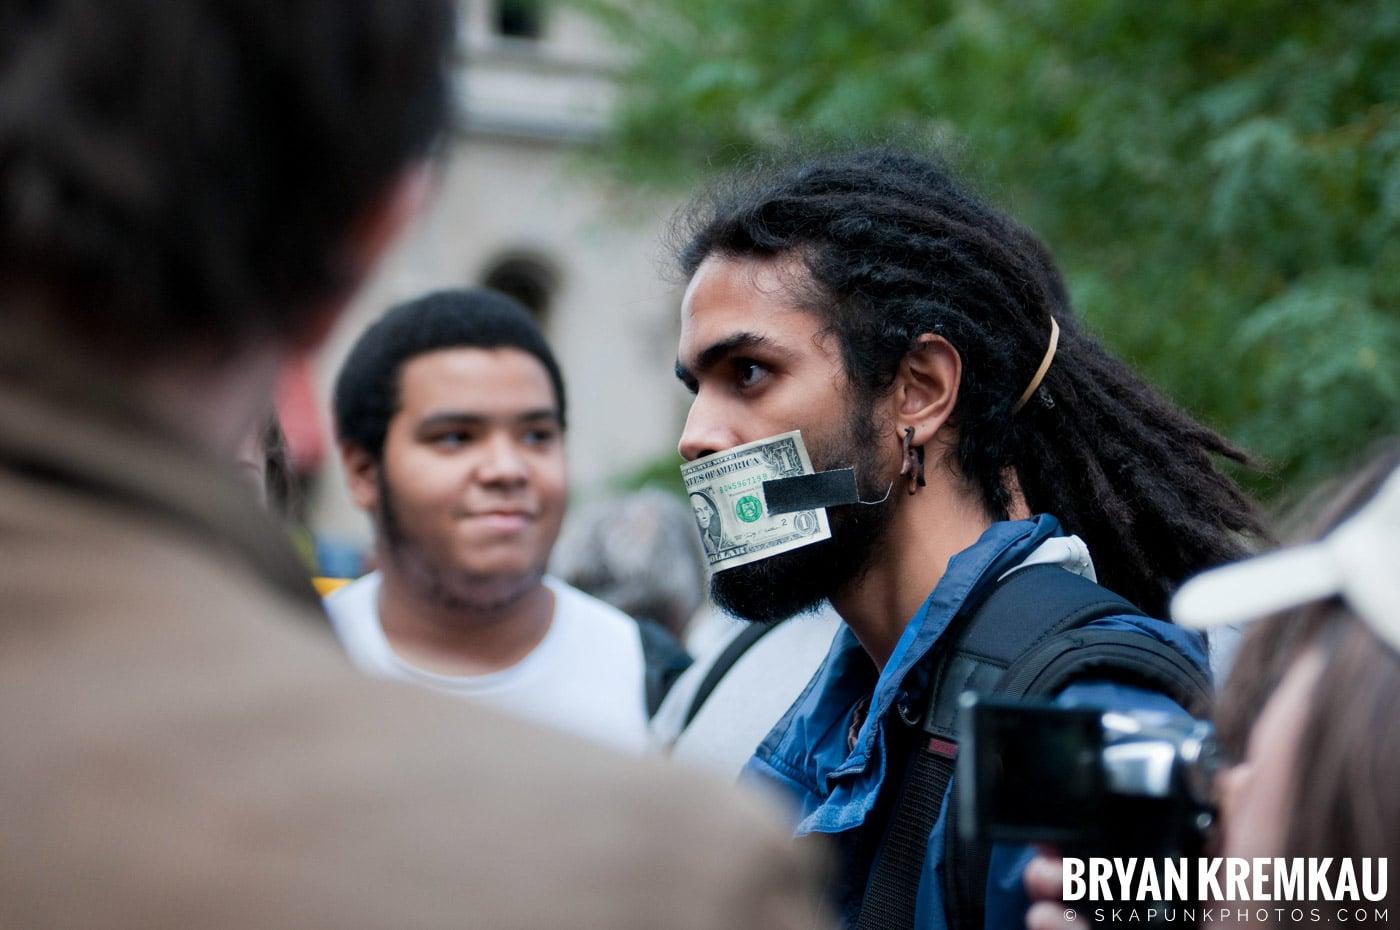 Occupy Wall Street @ Zuccotti Park and Washington Square Park, NYC - 10.15.11 (107)